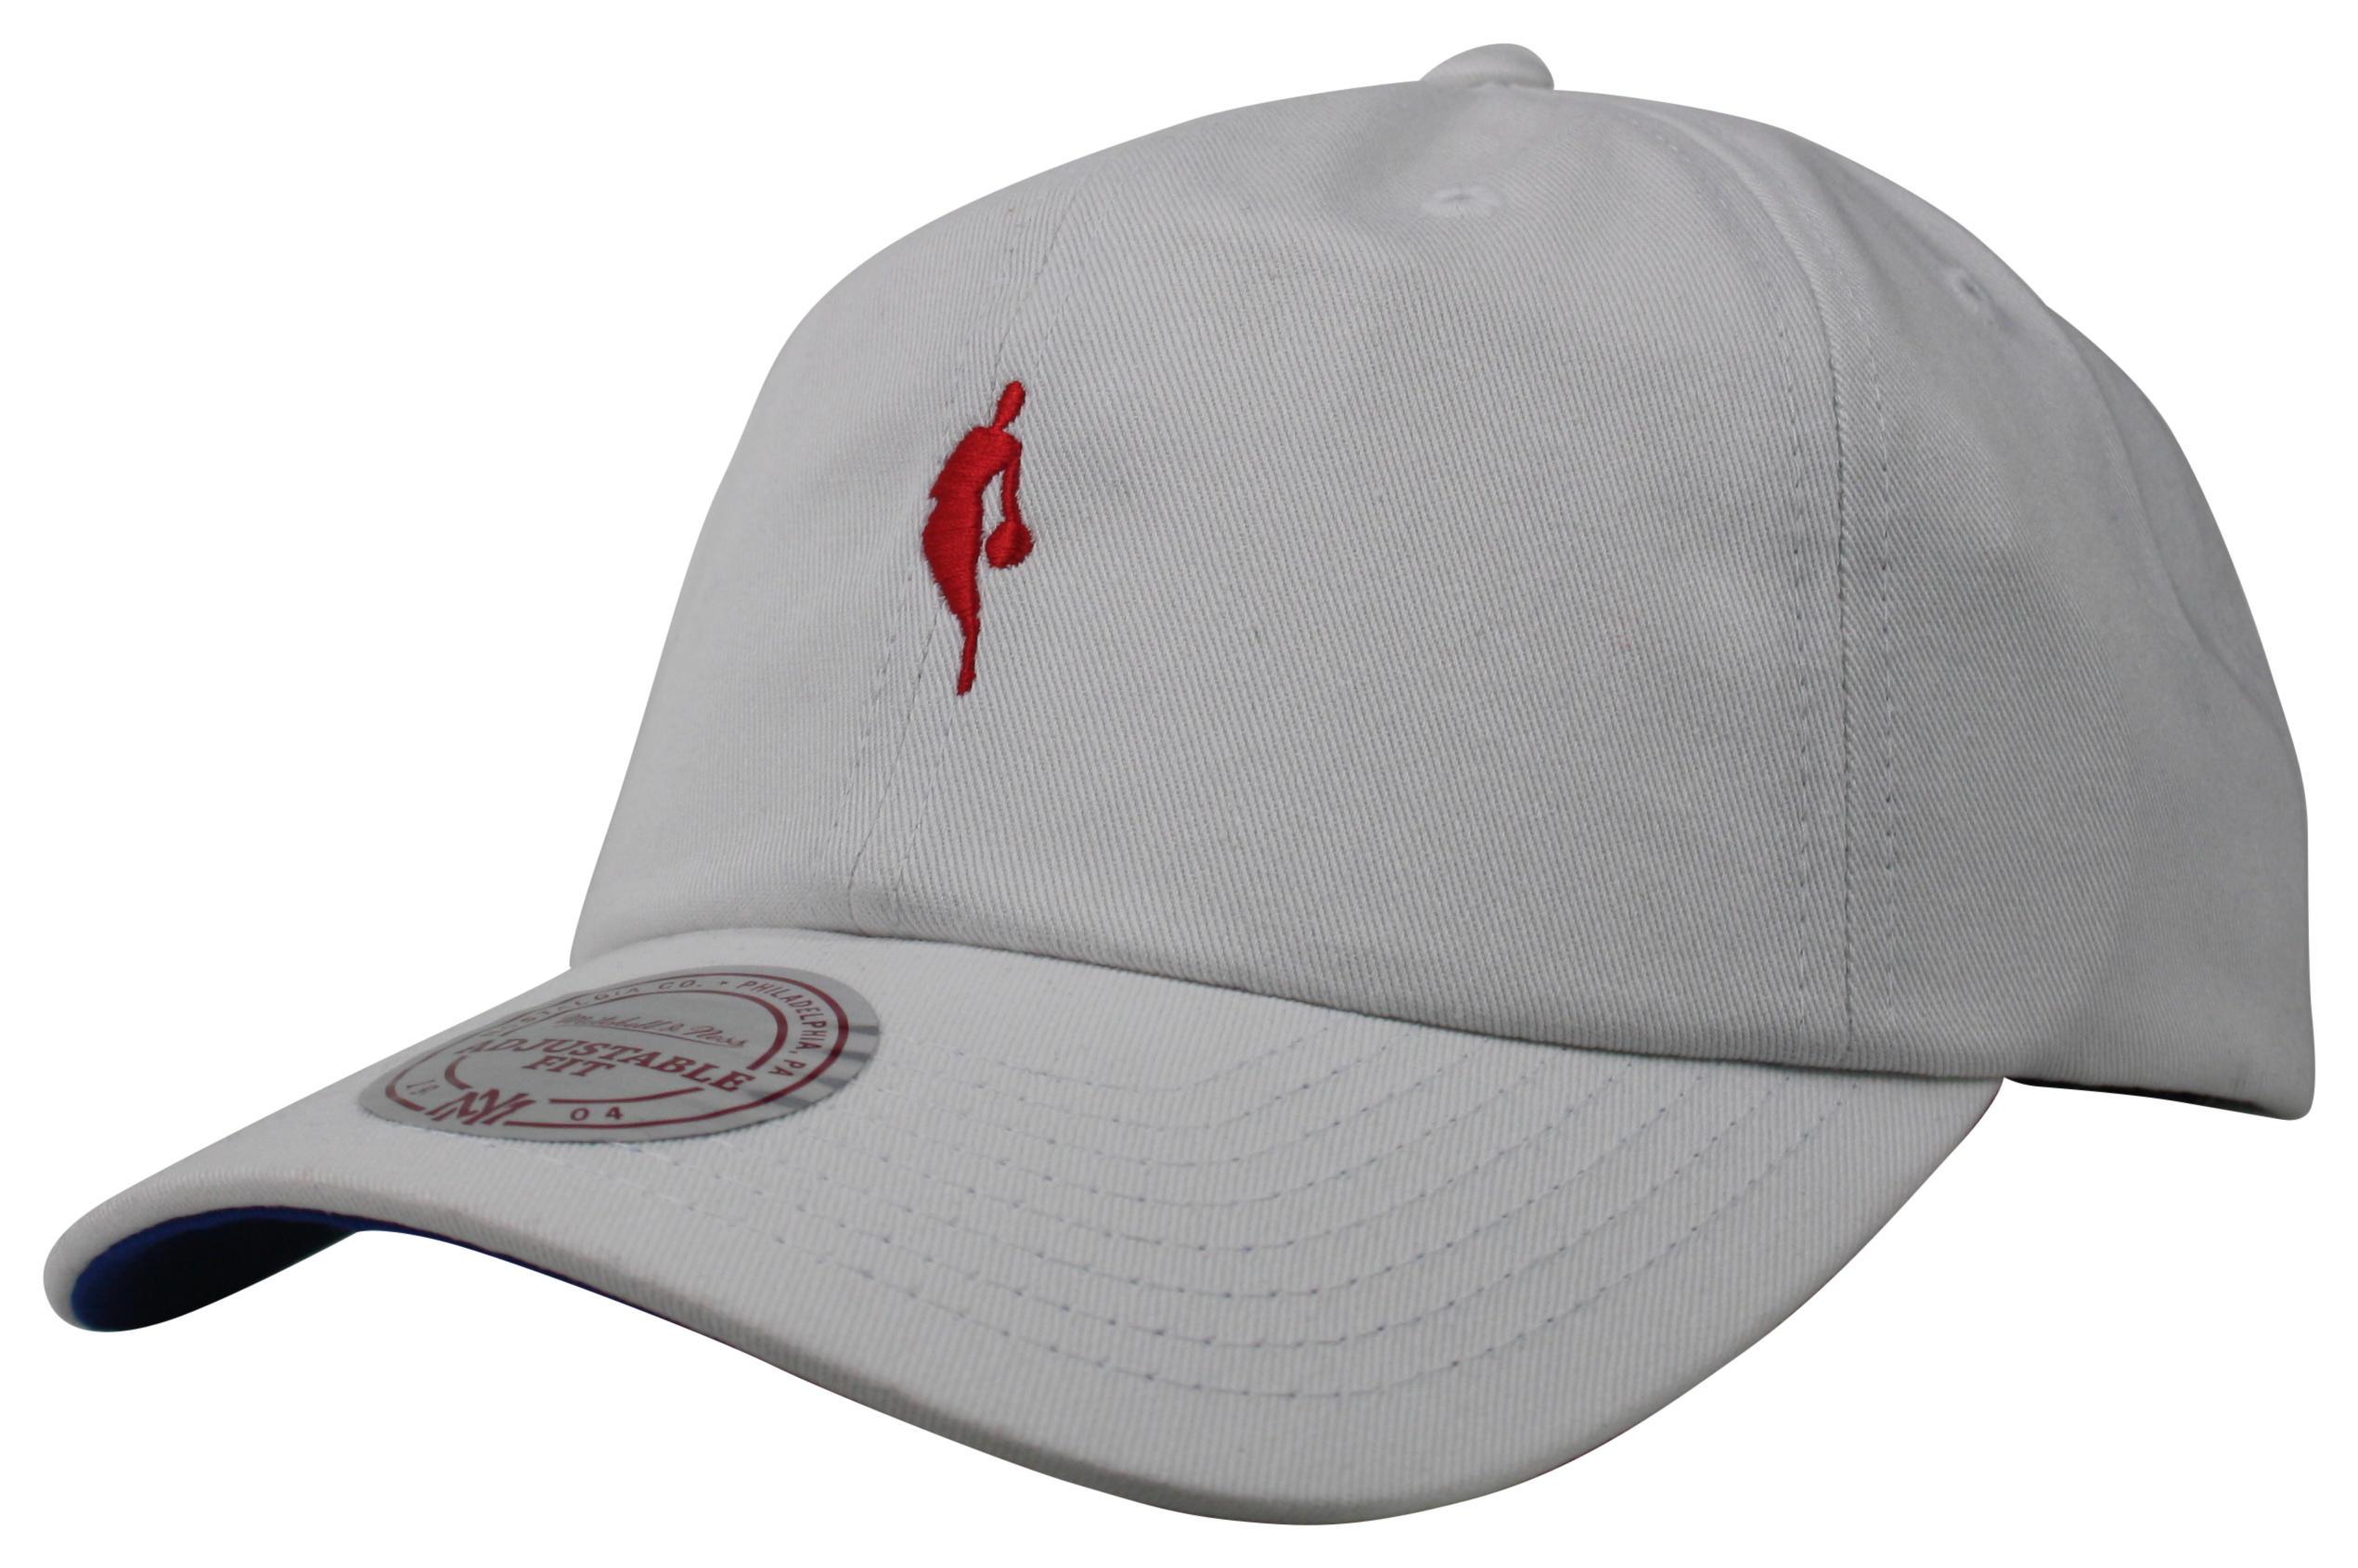 7a33a6b2 Mitchell & Ness | NBA Logoman White Little Dribbler Dad Hat Snapback